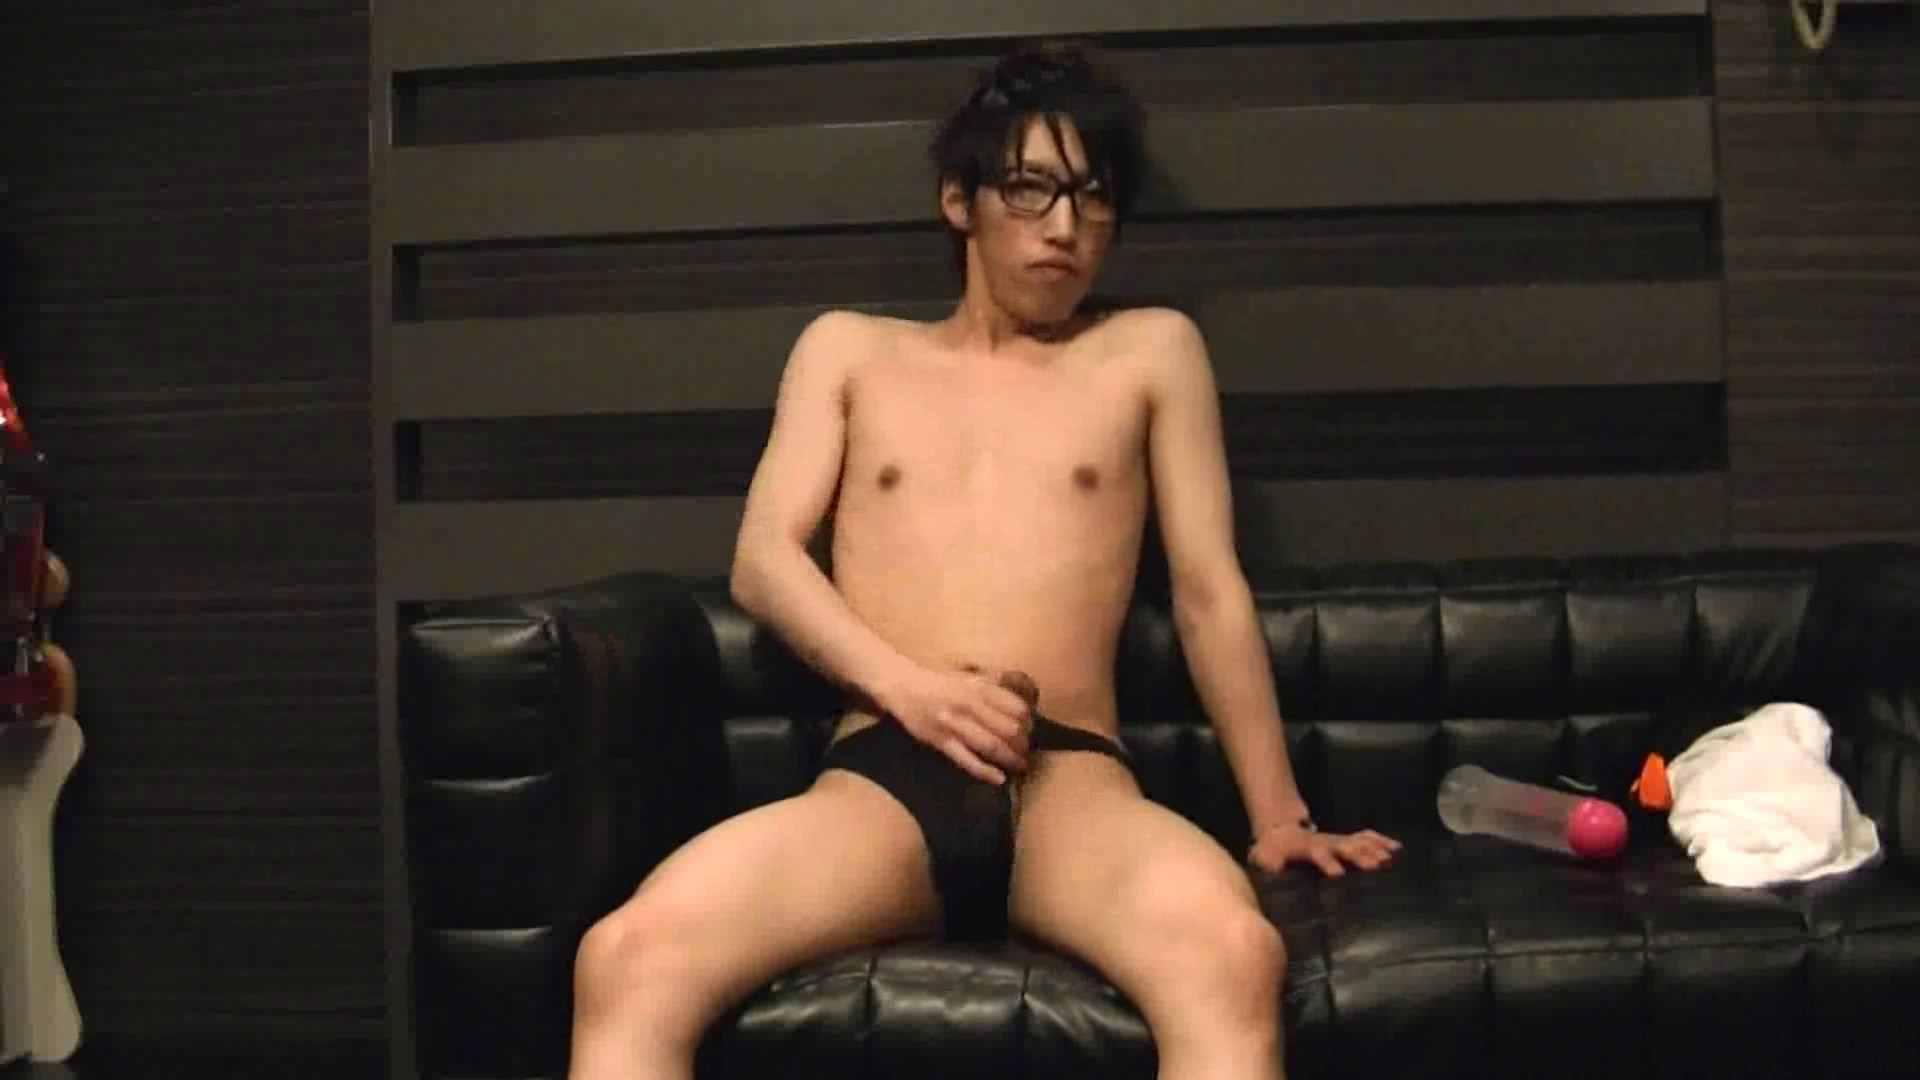 ONA見せカーニバル!! Vol3 男 ゲイ無料無修正画像 89枚 37